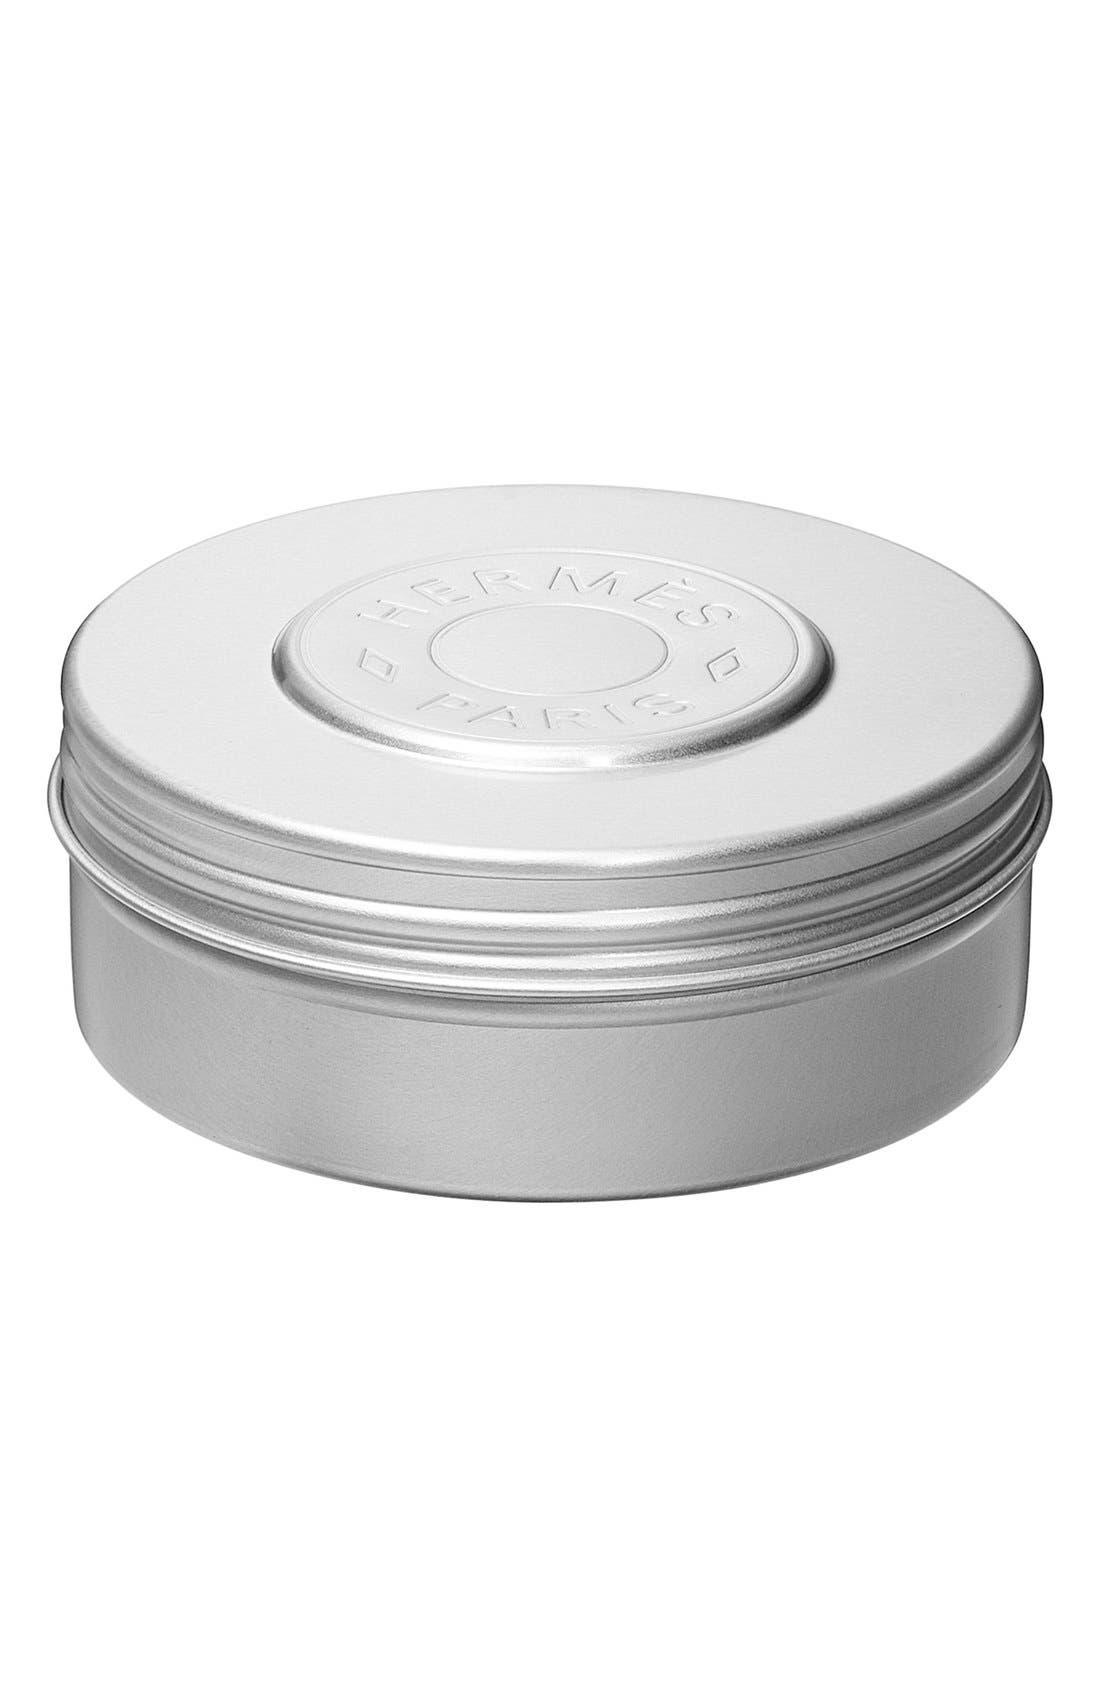 Hermès Eau de Gentiane Blanche - Face and body moisturizing balm